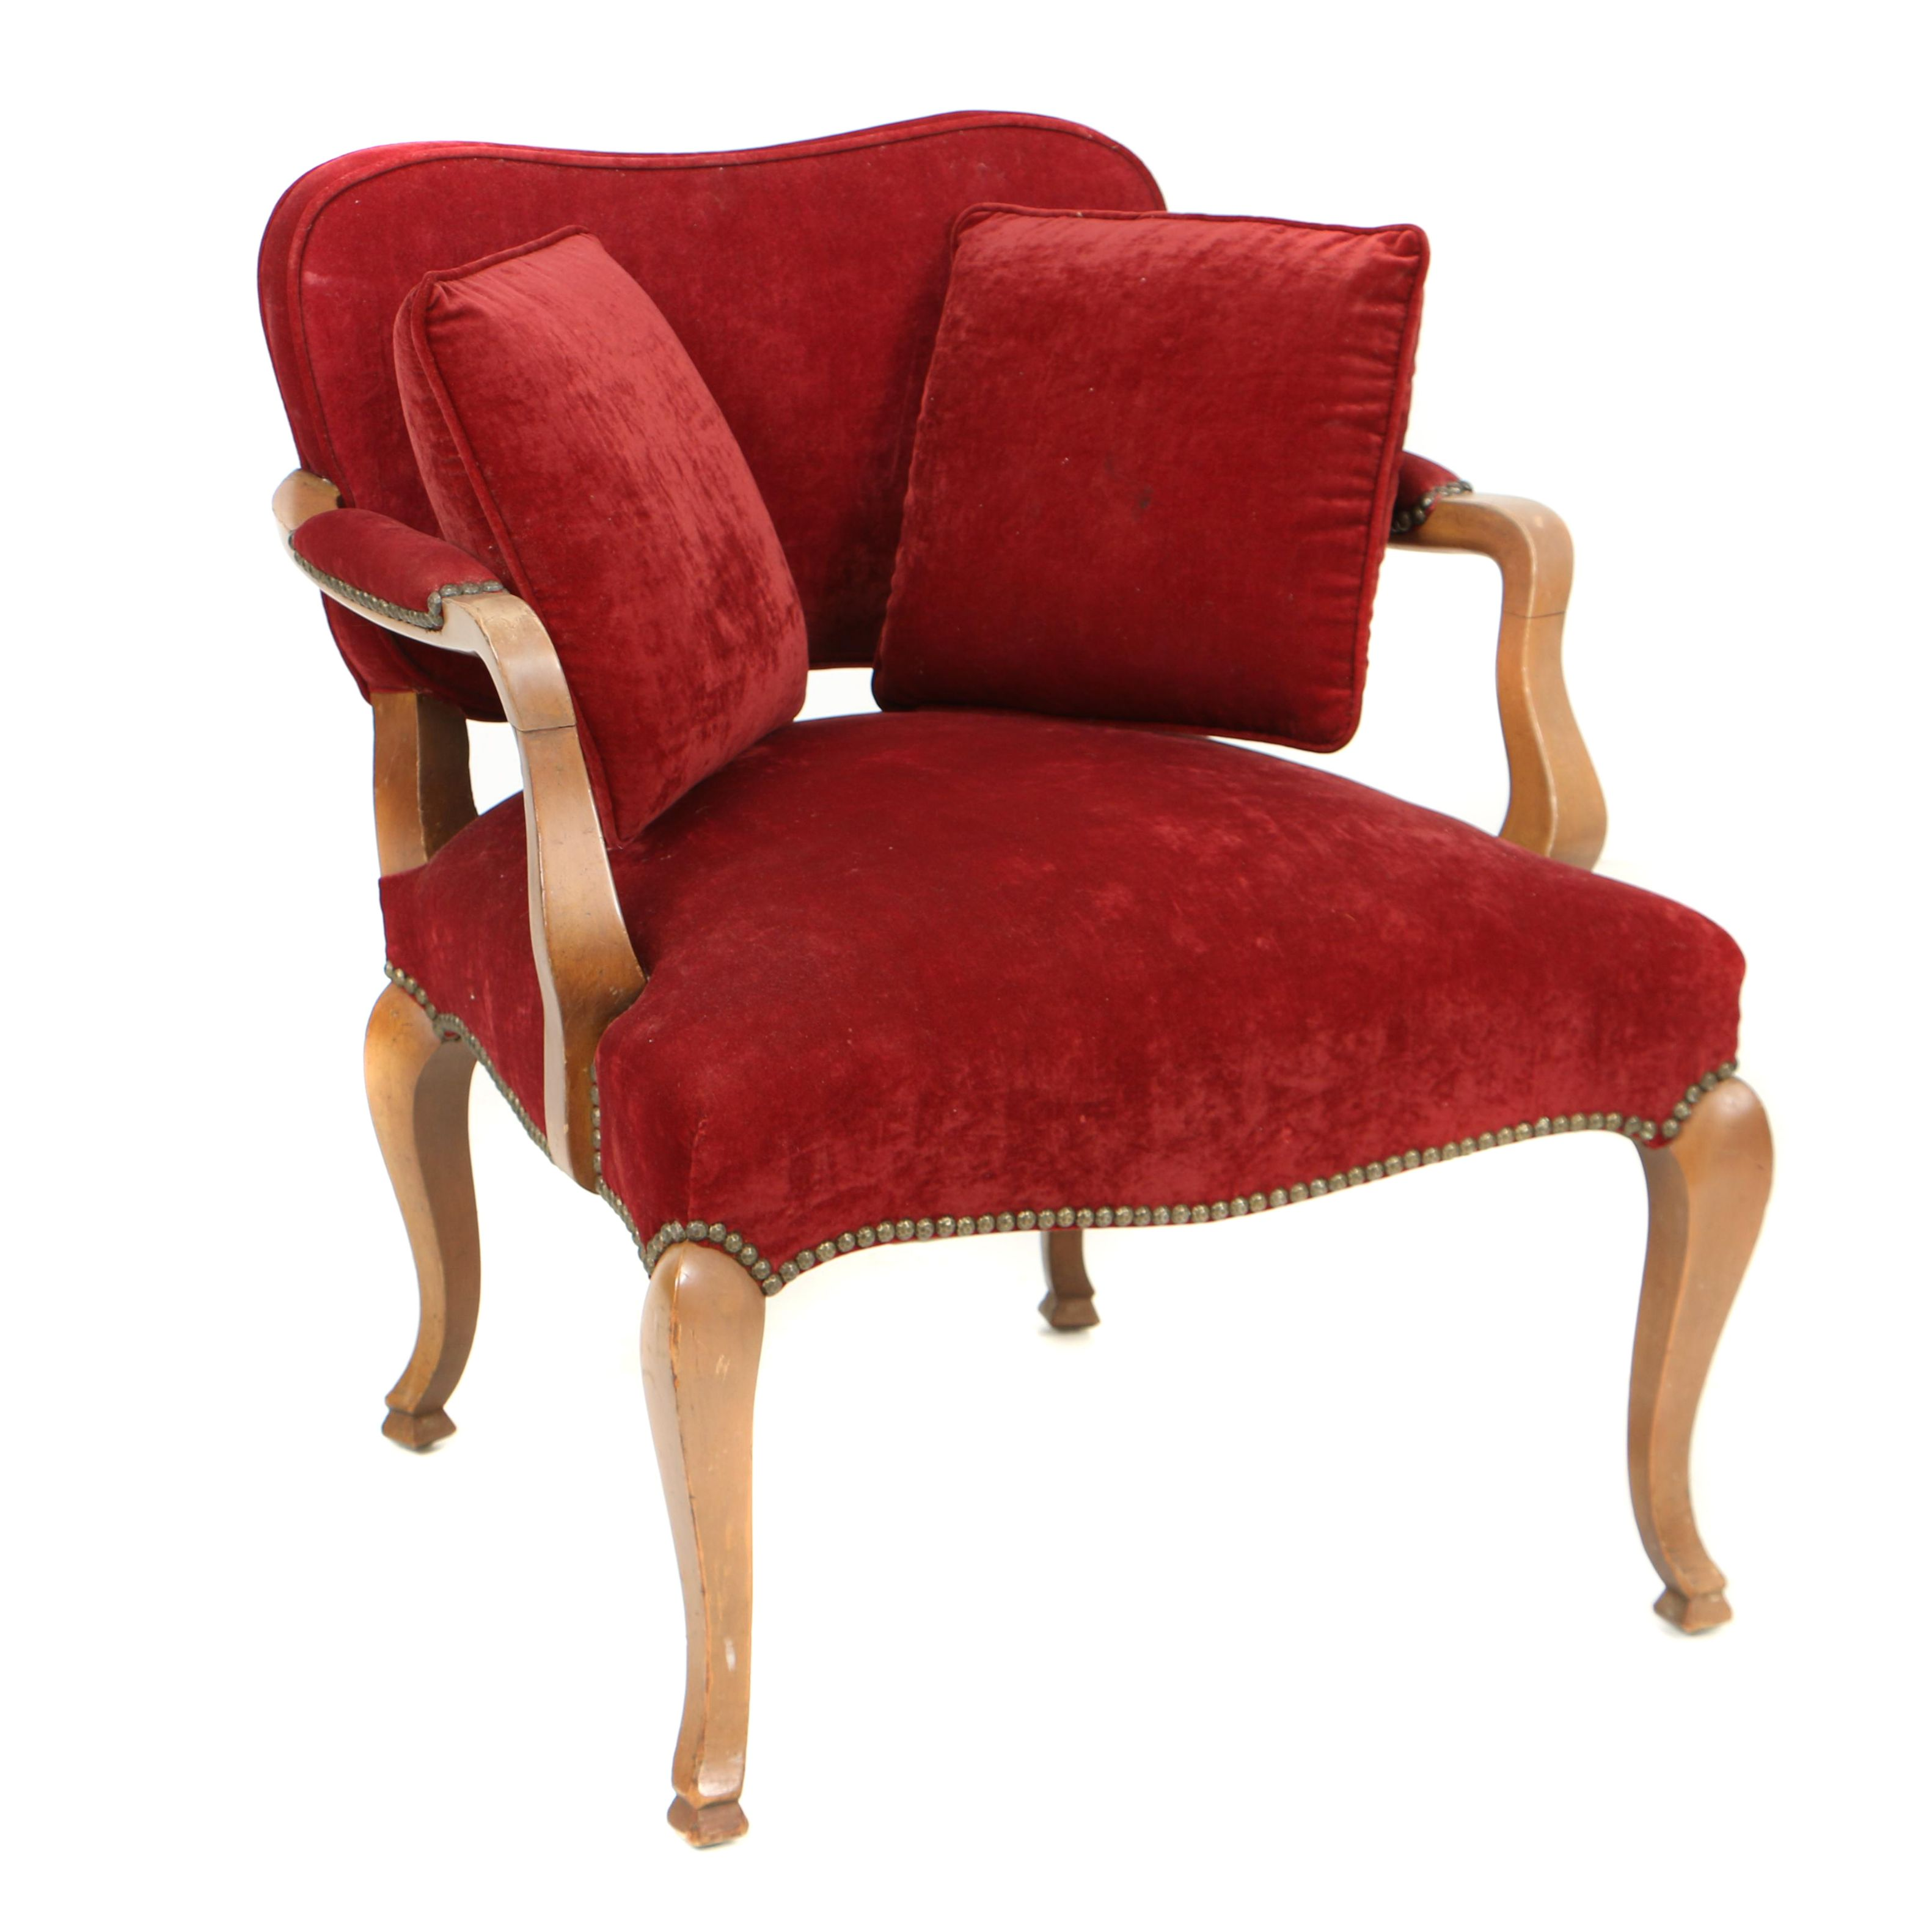 Vintage provincial louis xv style low back fauteuil